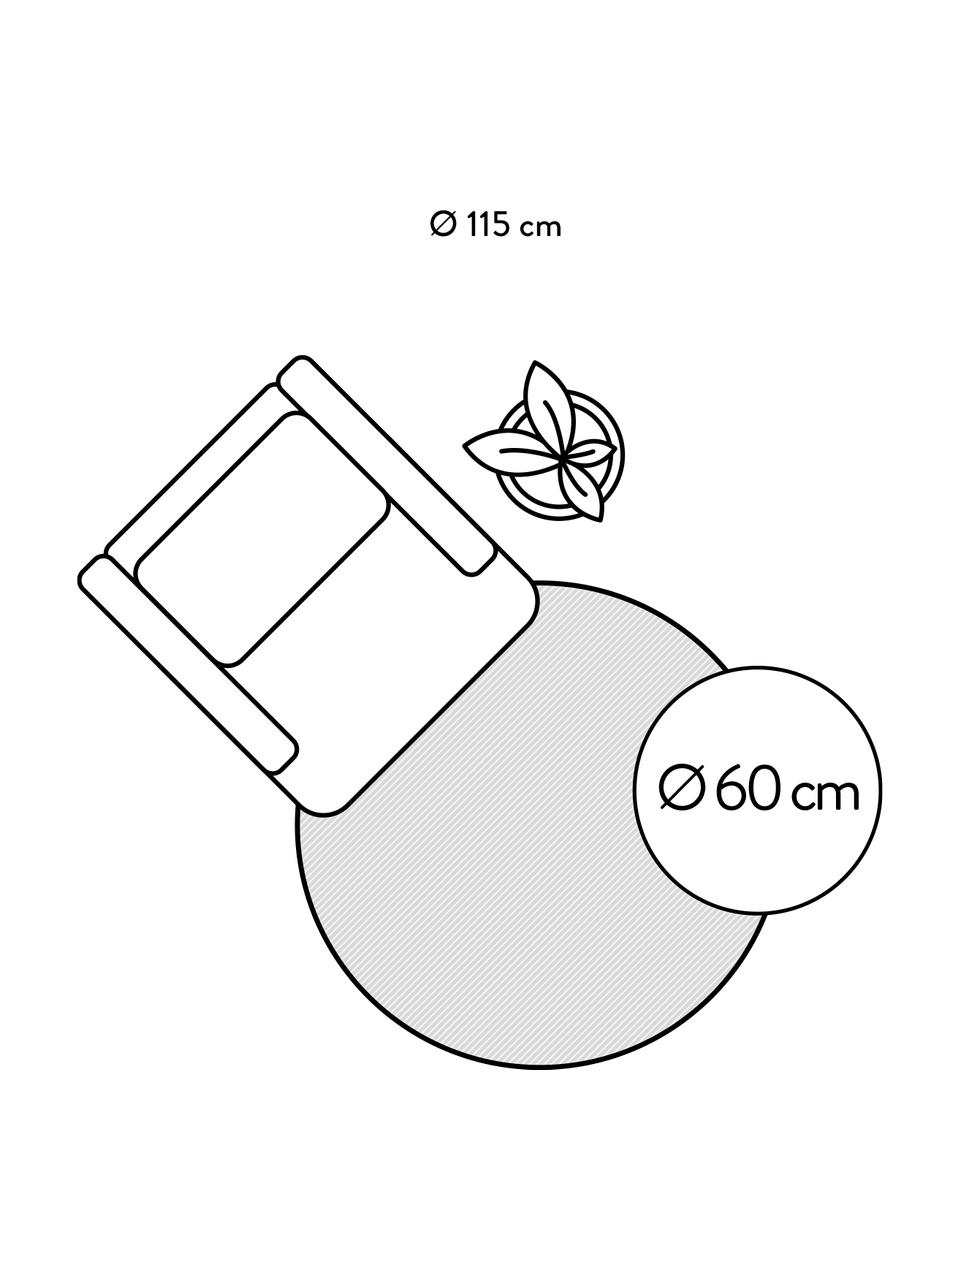 Runder Viskoseteppich Jane in Rosa, handgewebt, Flor: 100% Viskose, Rosa, Ø 200 cm (Größe L)